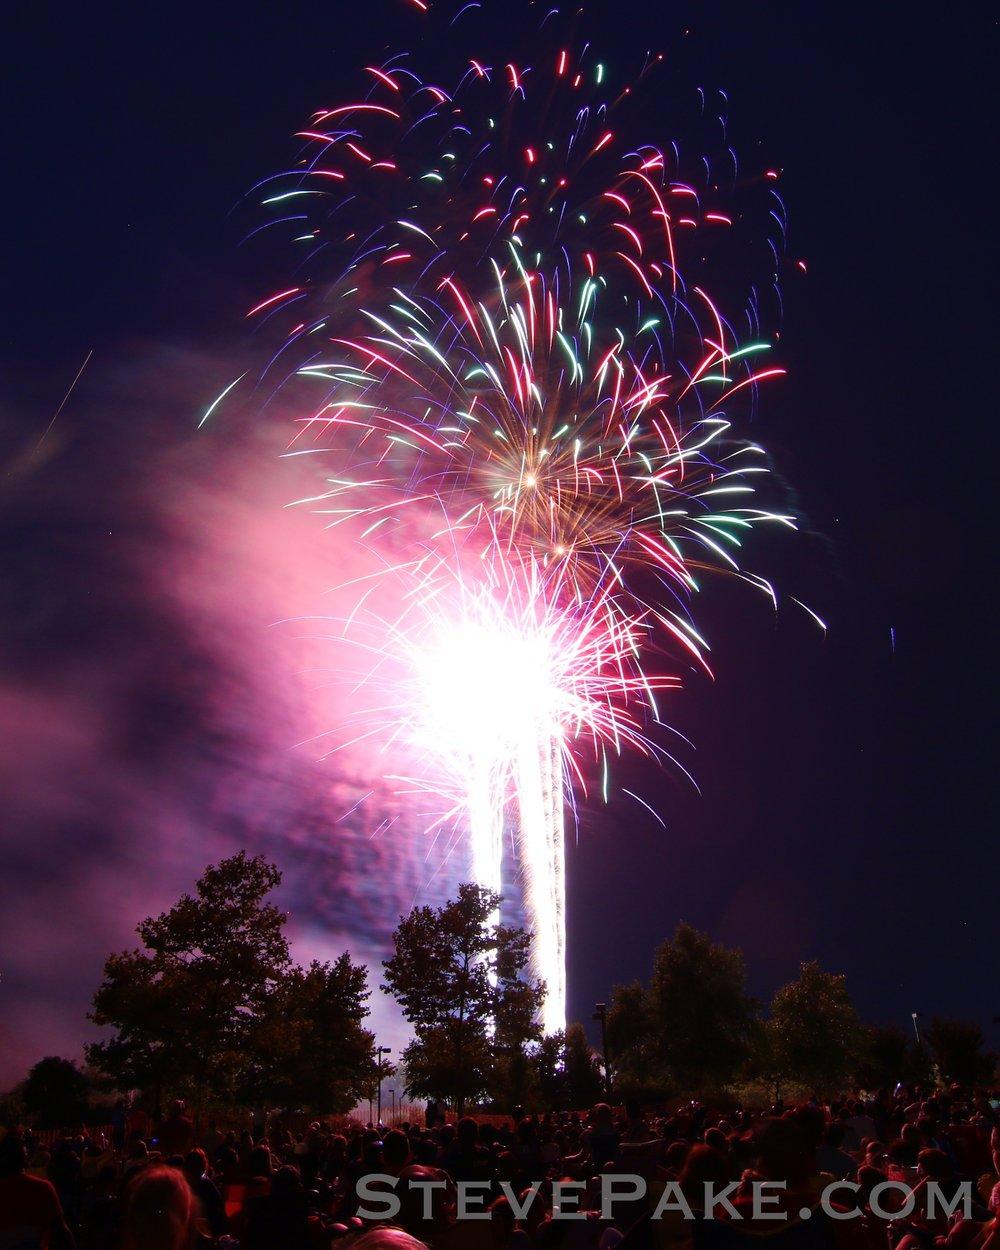 Fireworks2018_35_GE3A8568vap-HD-WM.jpg